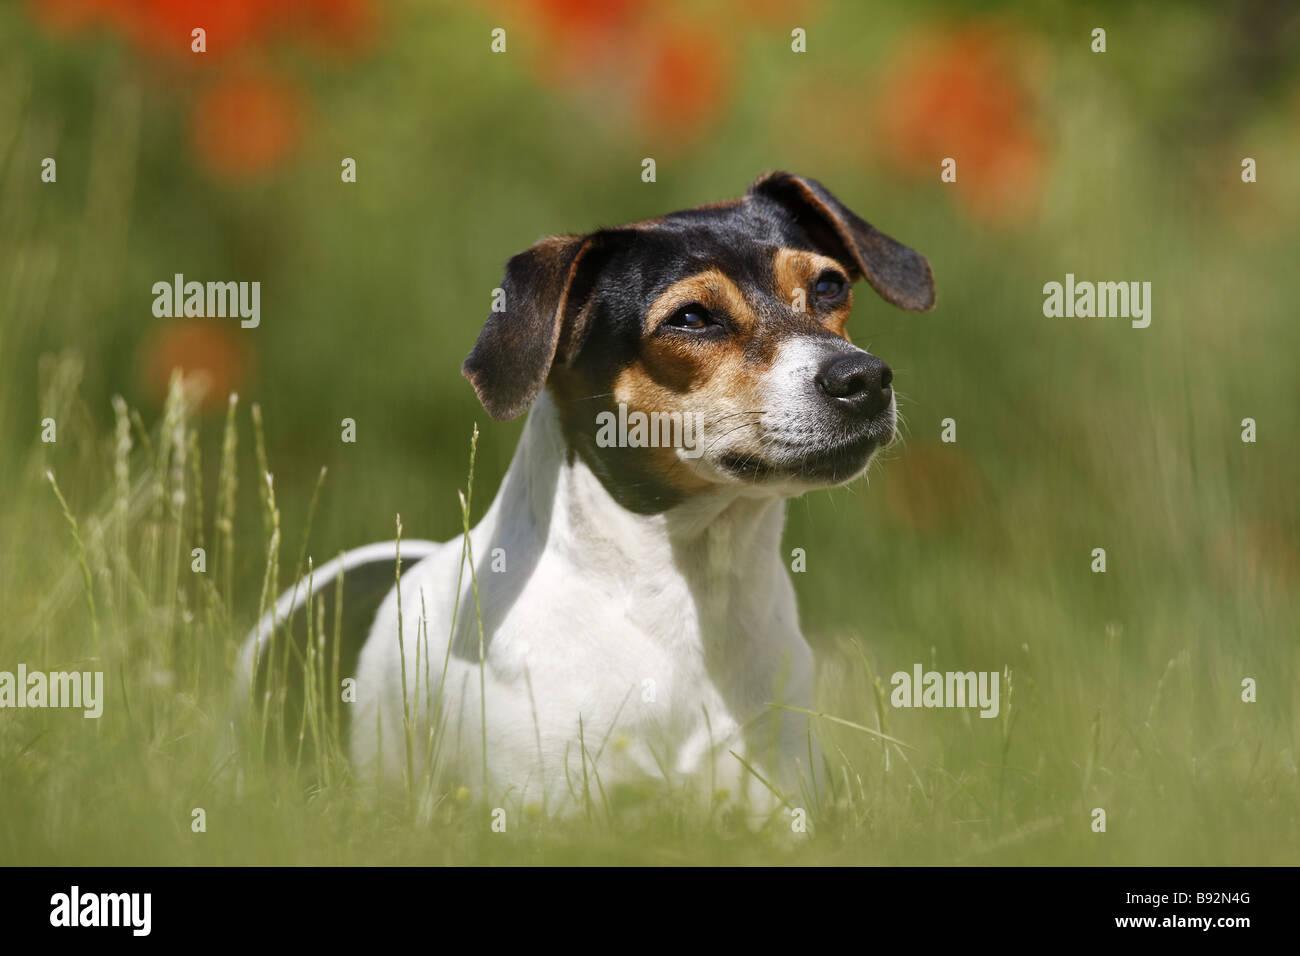 Danish Swedish Farmdog - standing on meadow Stock Photo